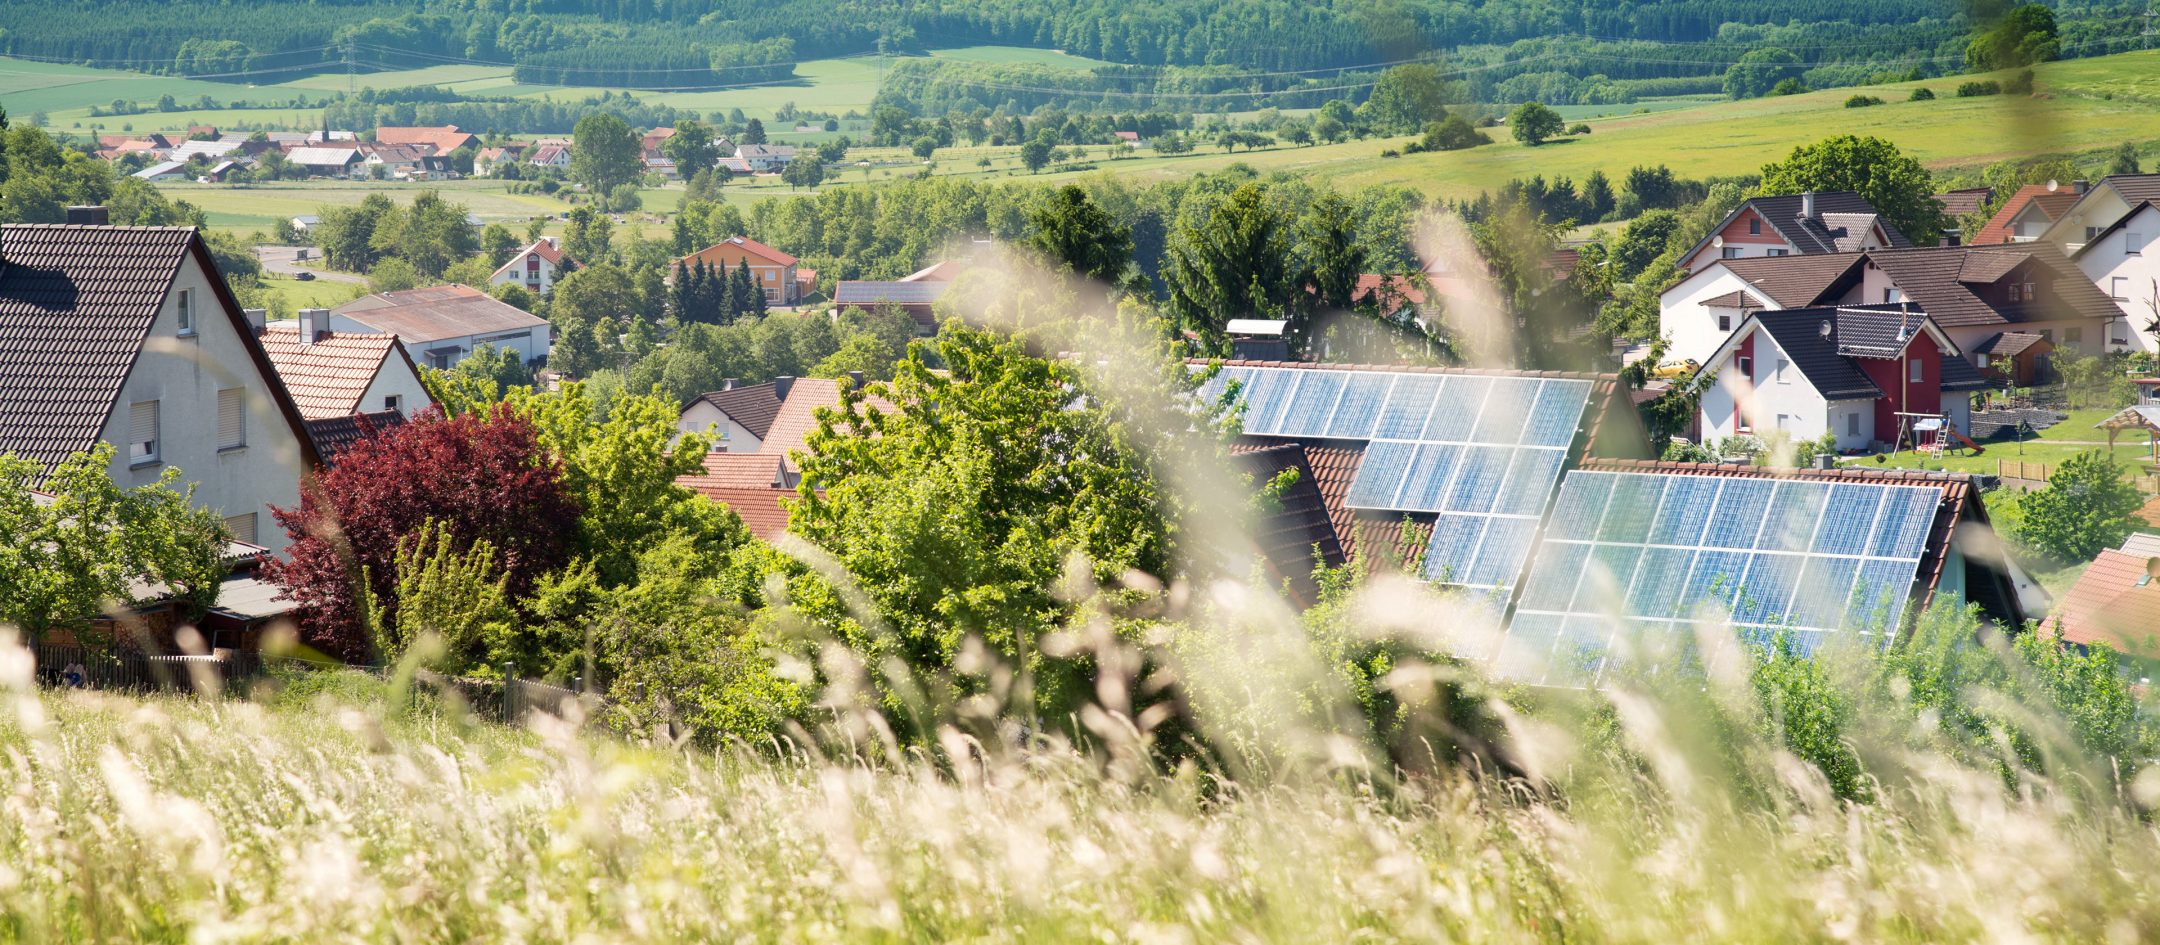 photovoltaik-post-eeg-3840x1730